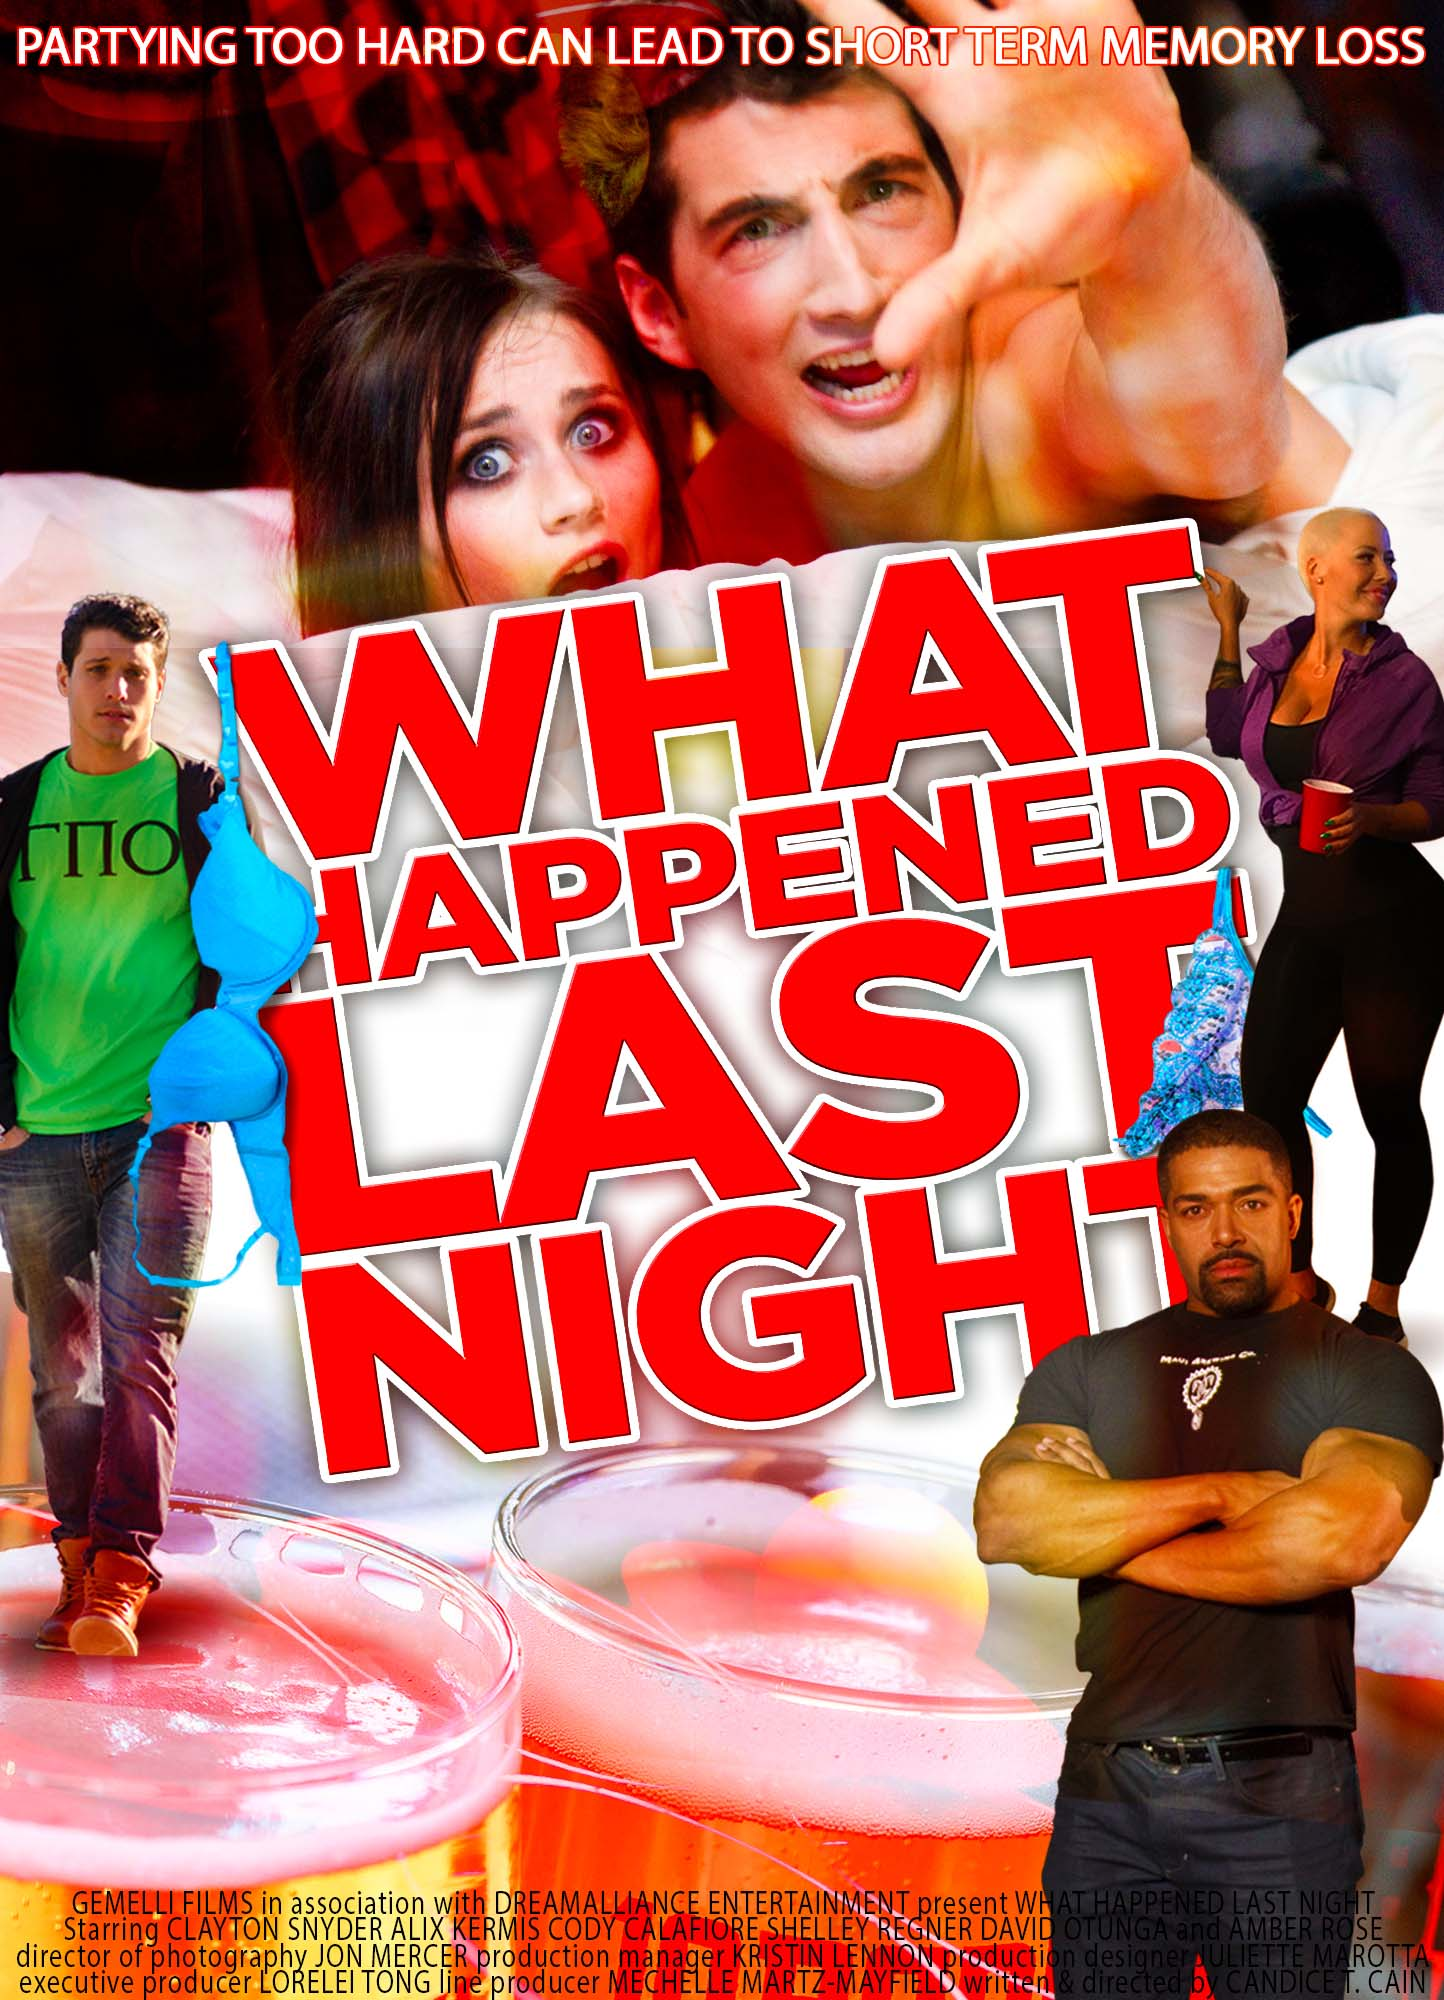 WHAT HAPPENED LAST NIGHT